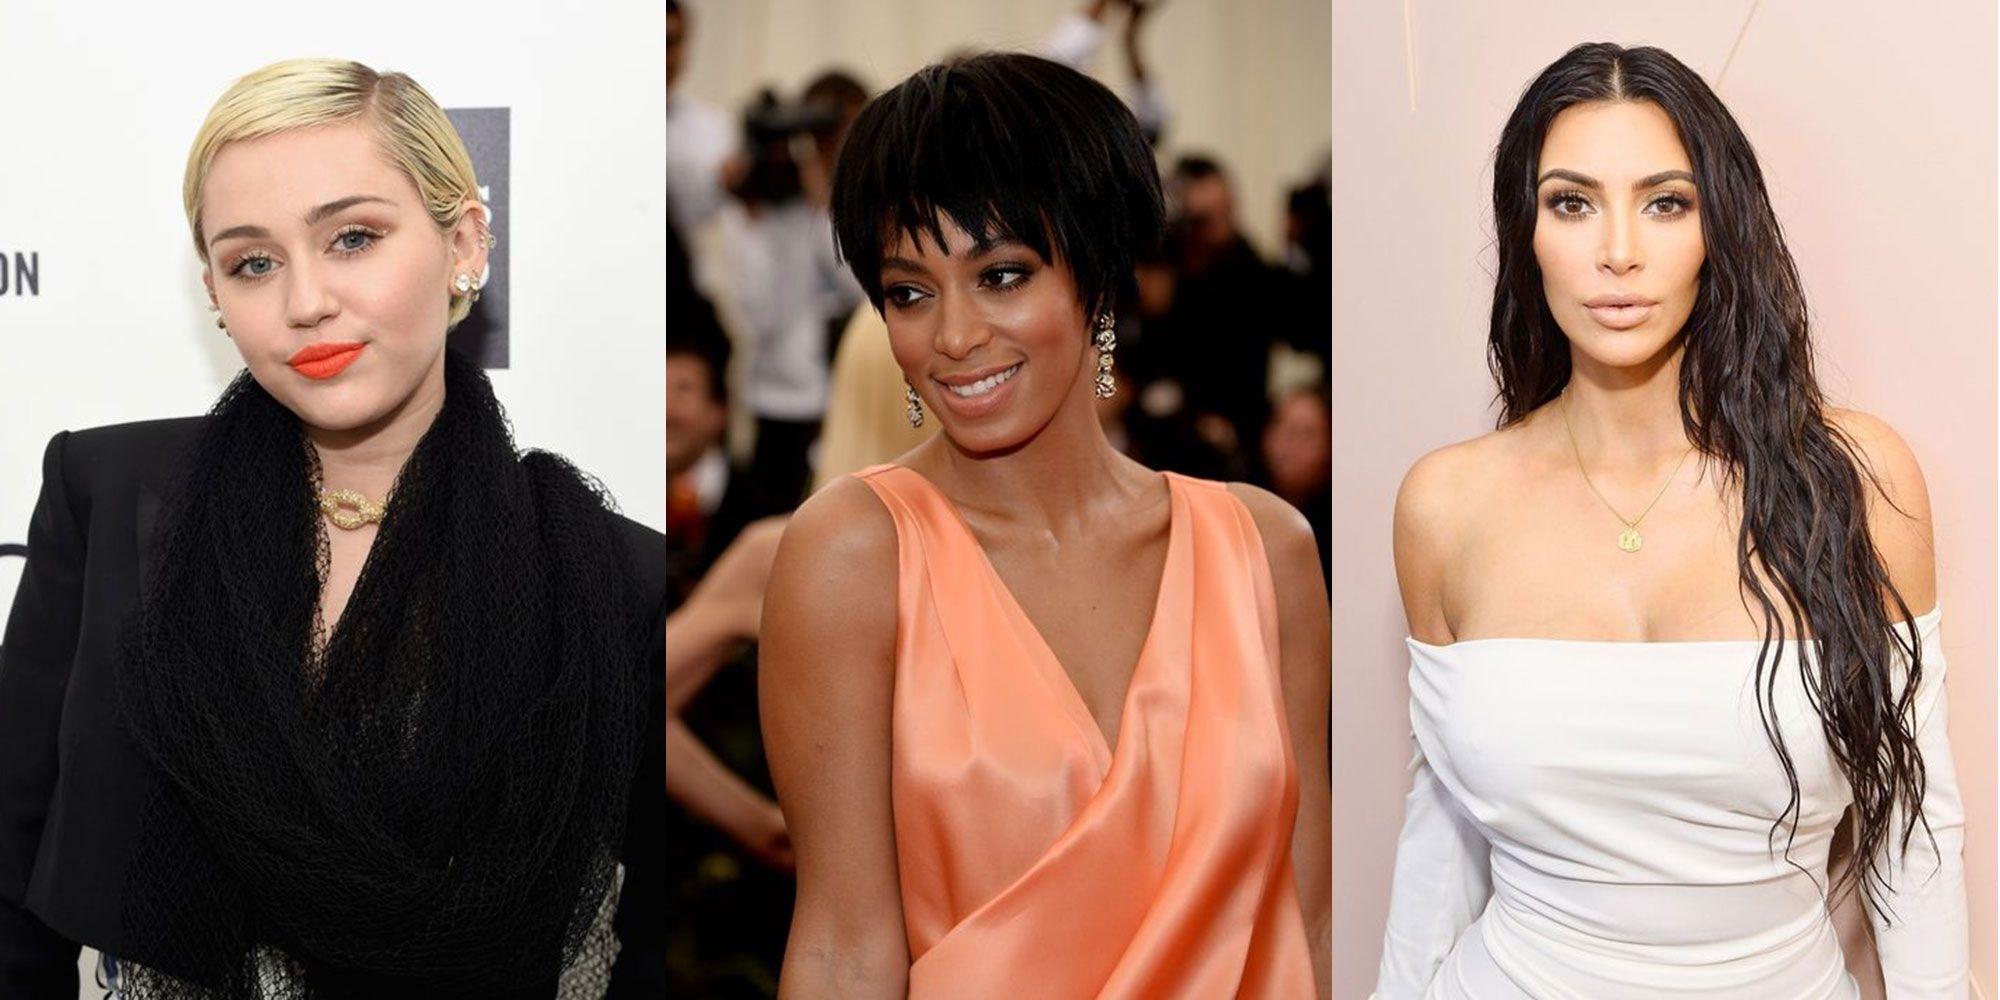 Celebrity pubic hair quotes